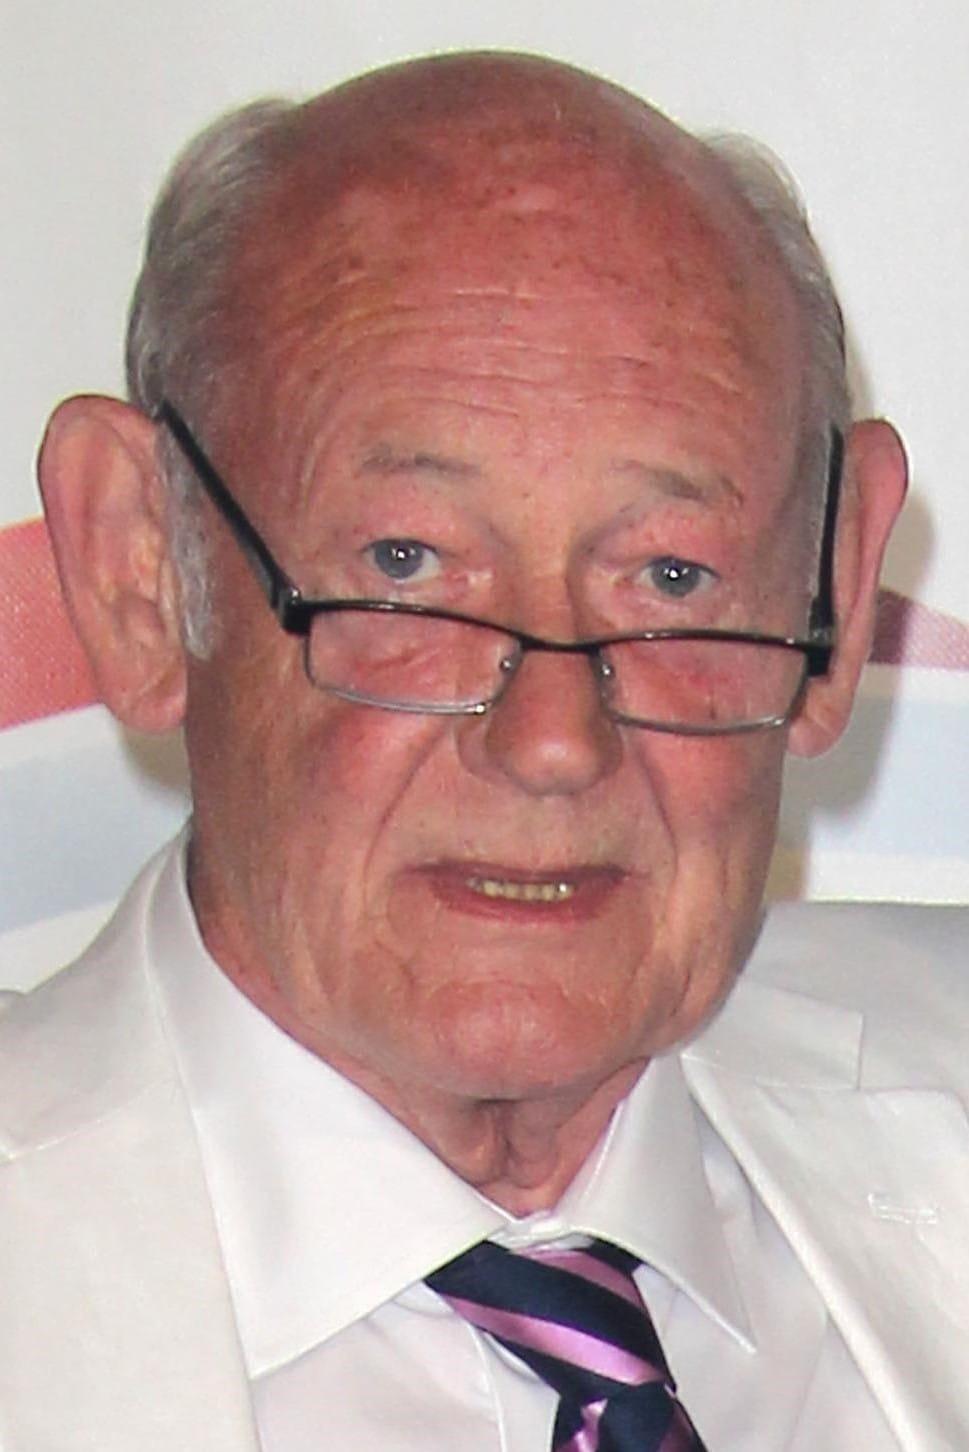 Barry Hanson